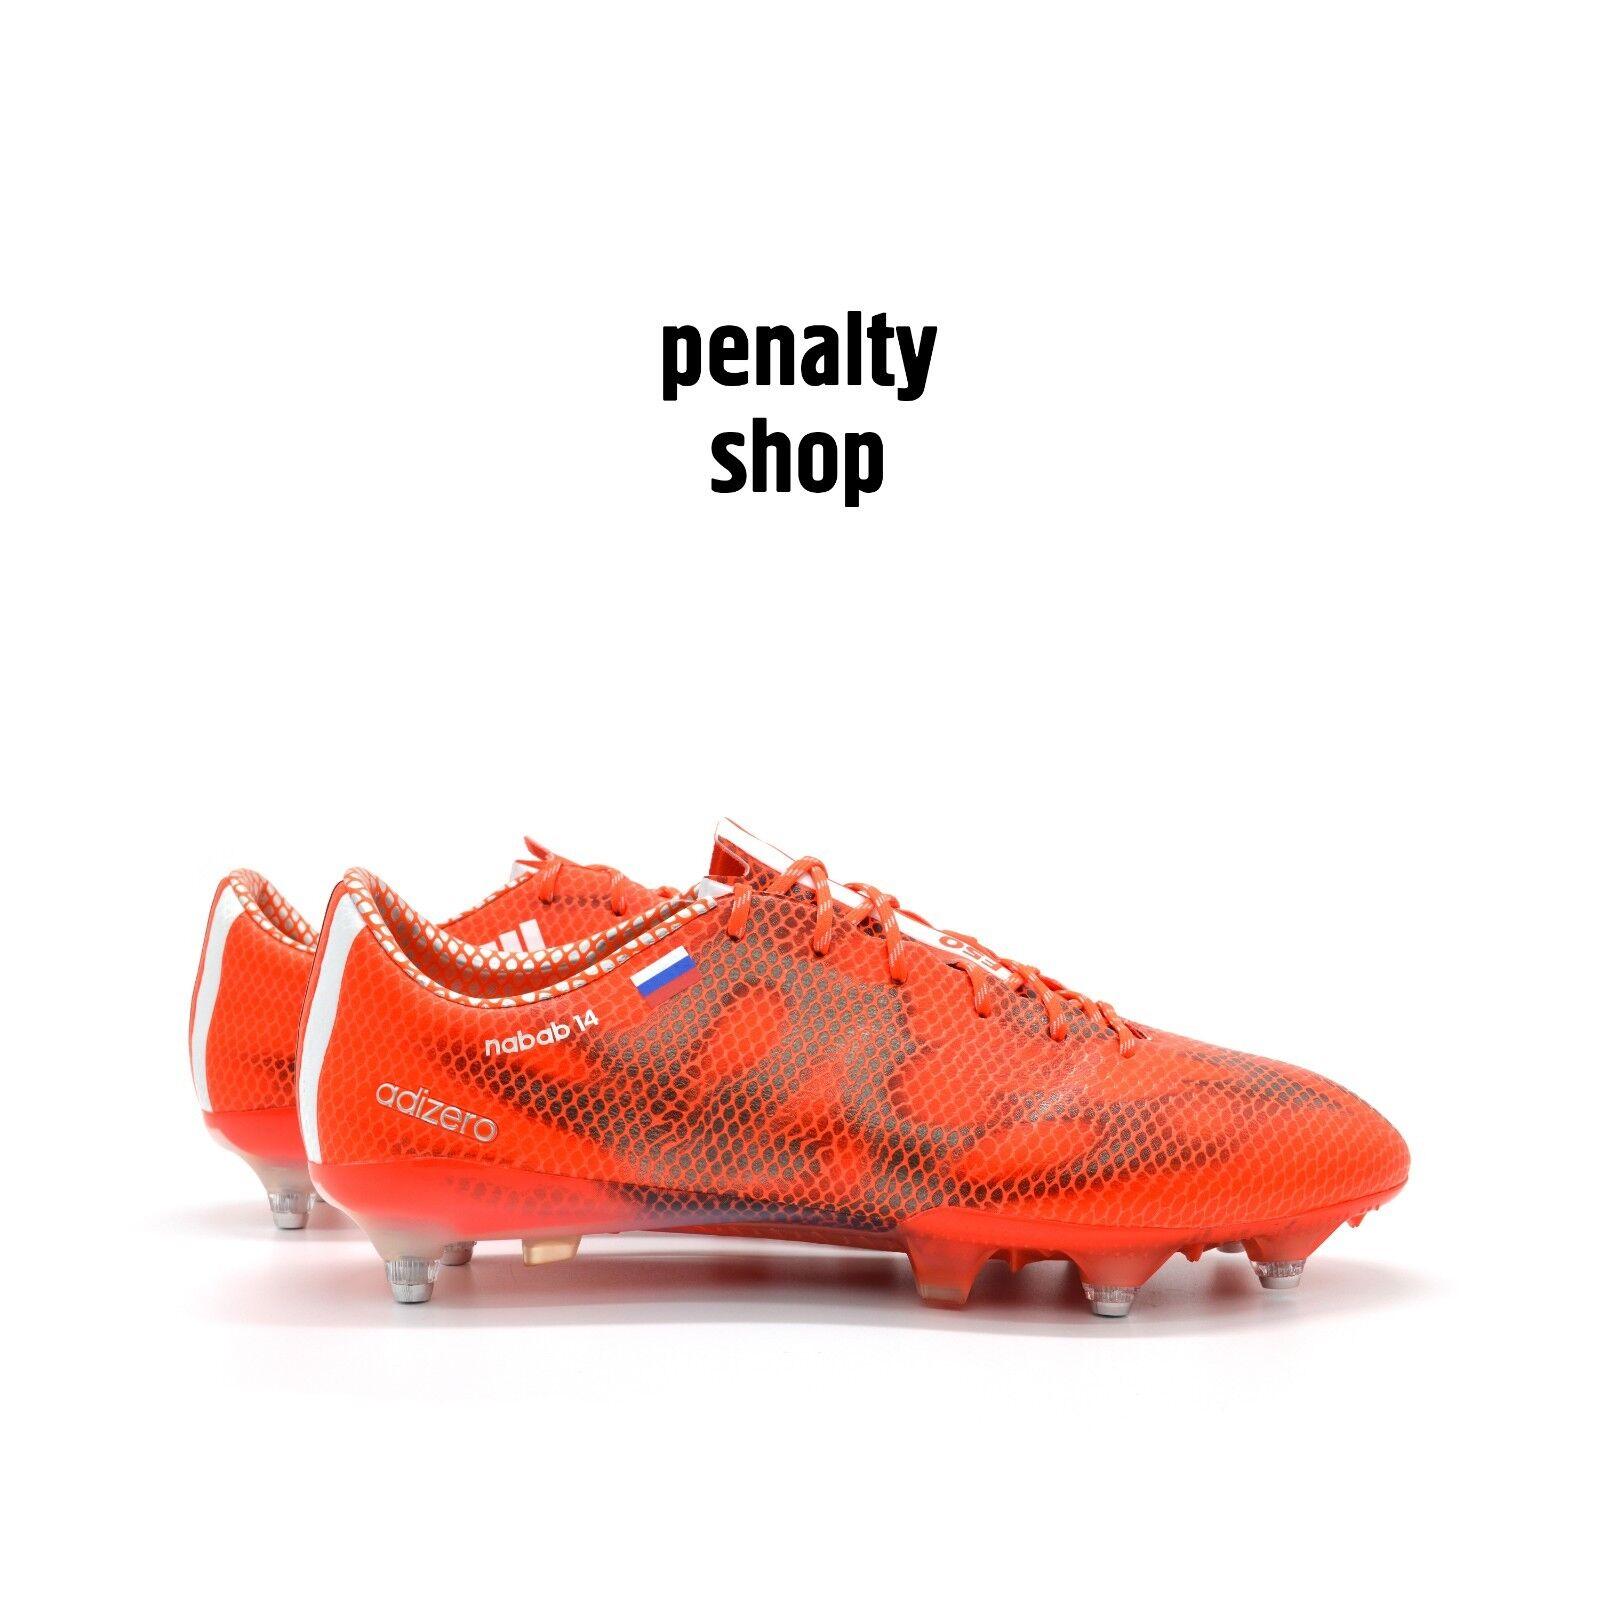 4cec3d9cf Adidas adiZero F50 SG M29346 9 US Kirill Nababkin PFC CSKA Match Worn Boots  RARE